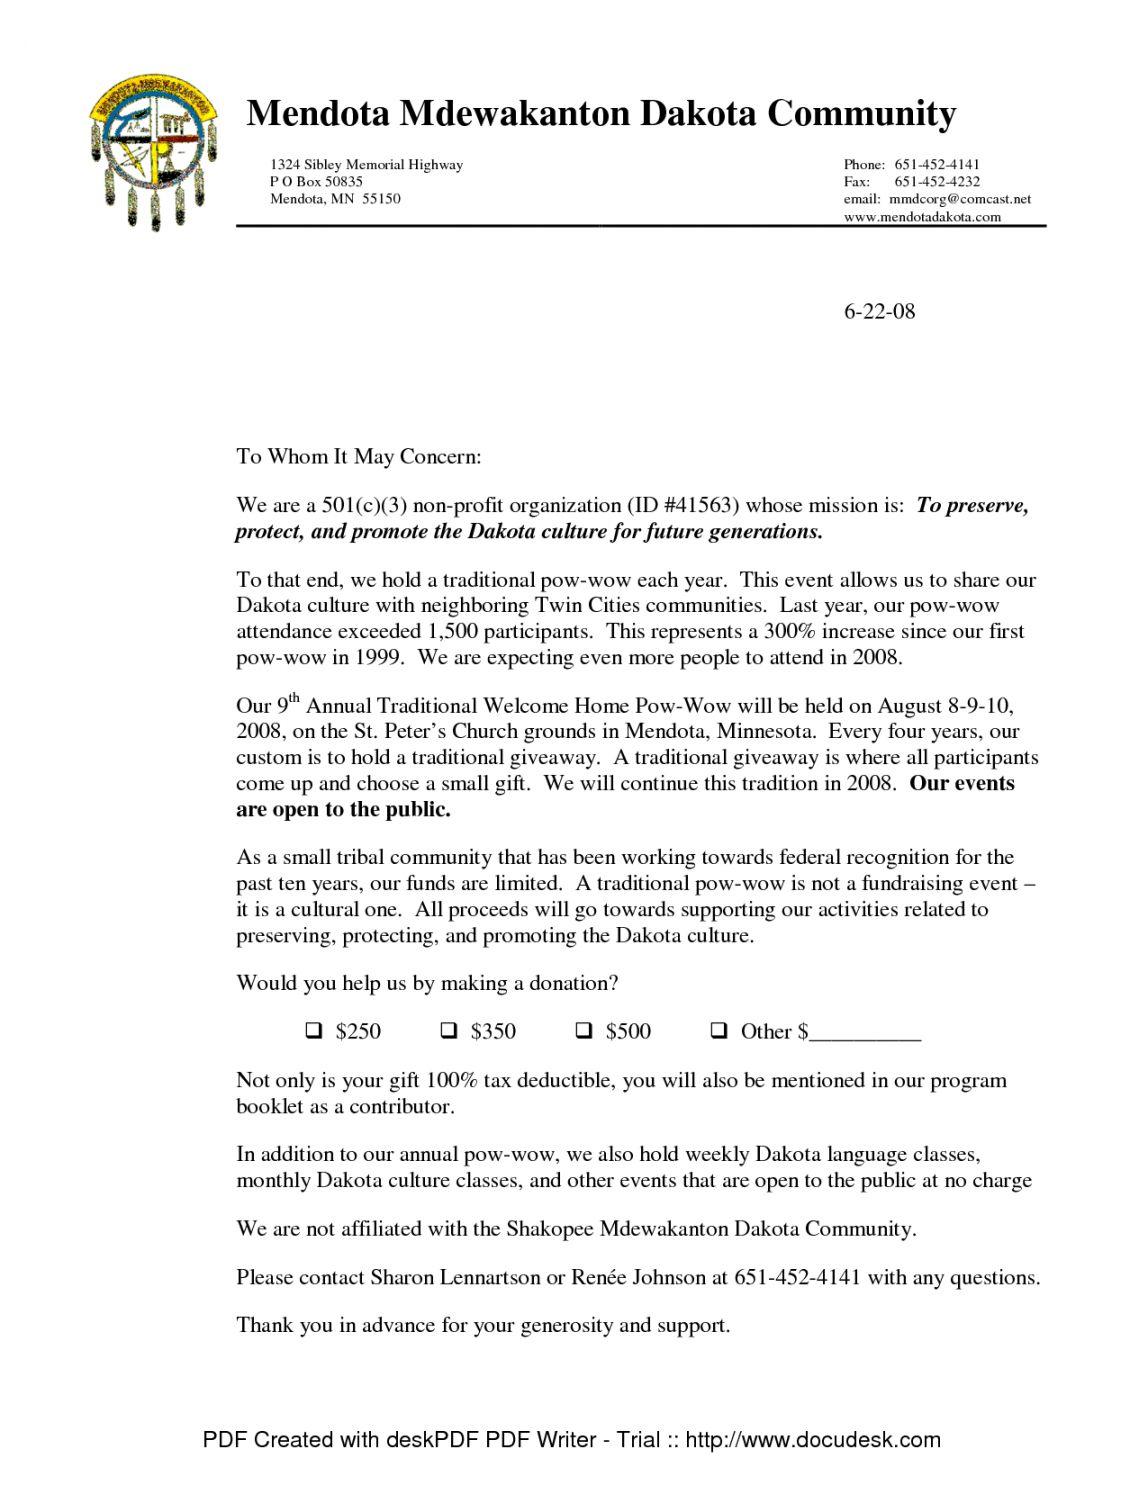 Editable Nonprofit Donation Request Letter Template Donation Fundraising Letter For Non Prof Donation Letter Template Donation Letter Fundraising Letter